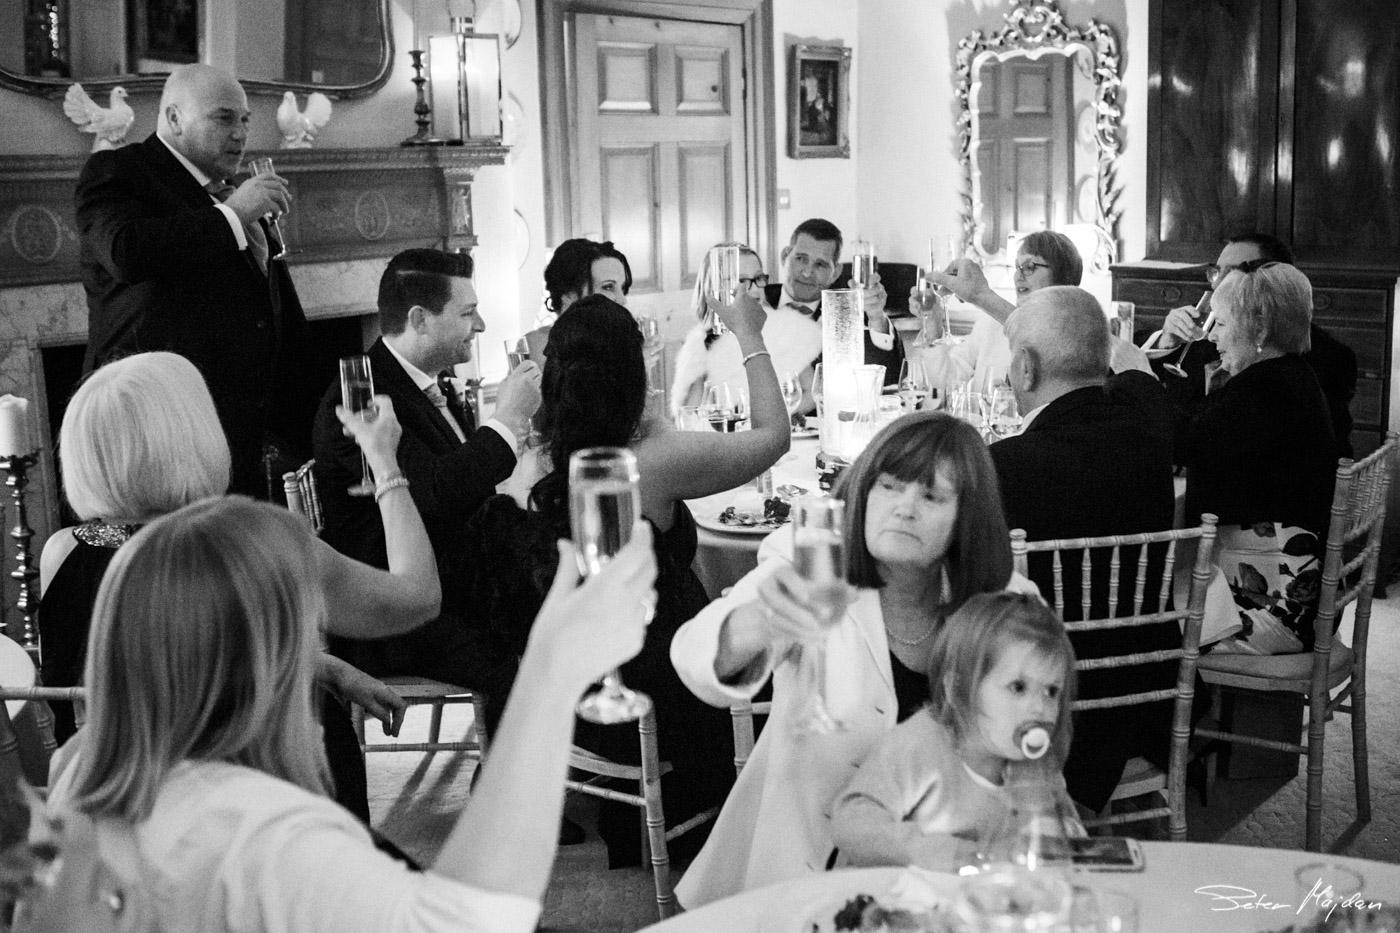 east-bridgford-hill-wedding-photography-56.jpg